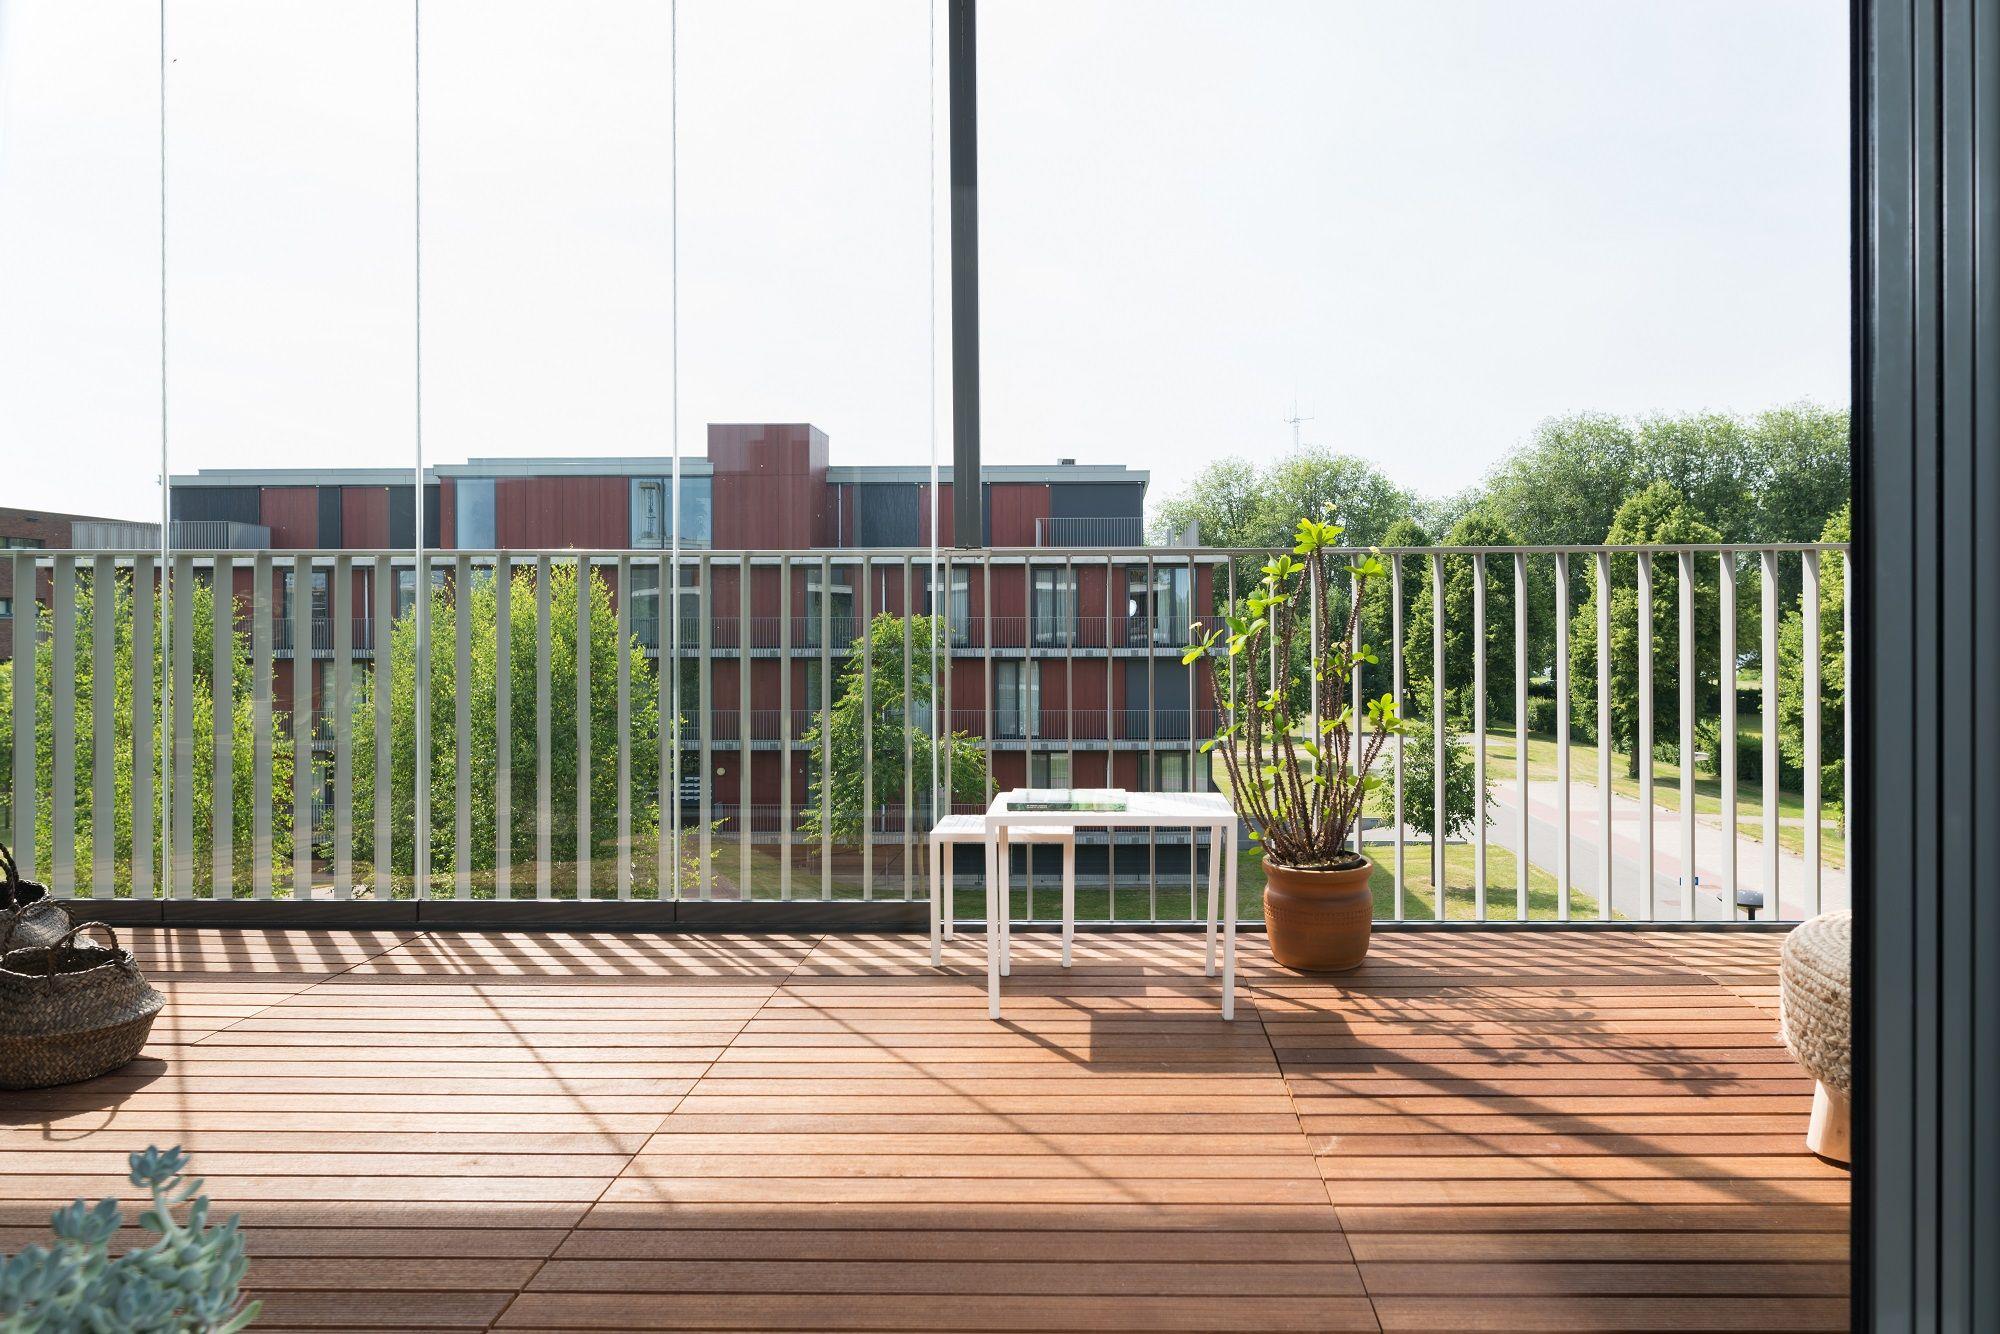 Balkonbeglazing dronten